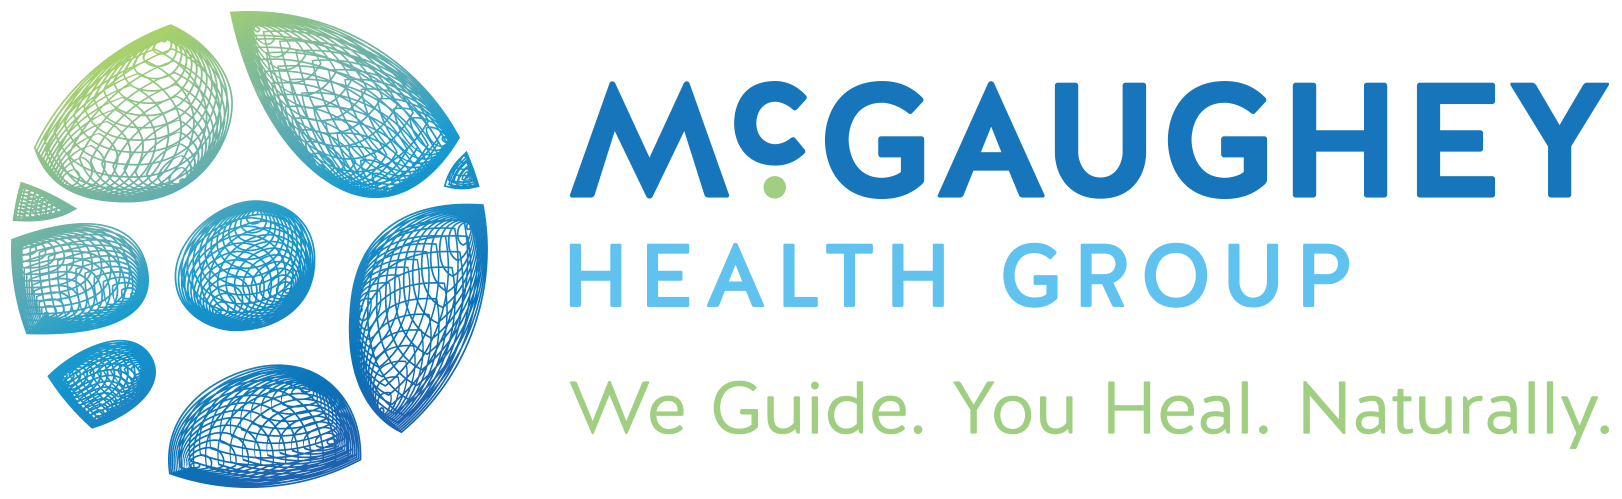 McGaughey Chiropractic Naturopathic Doctor logo footer